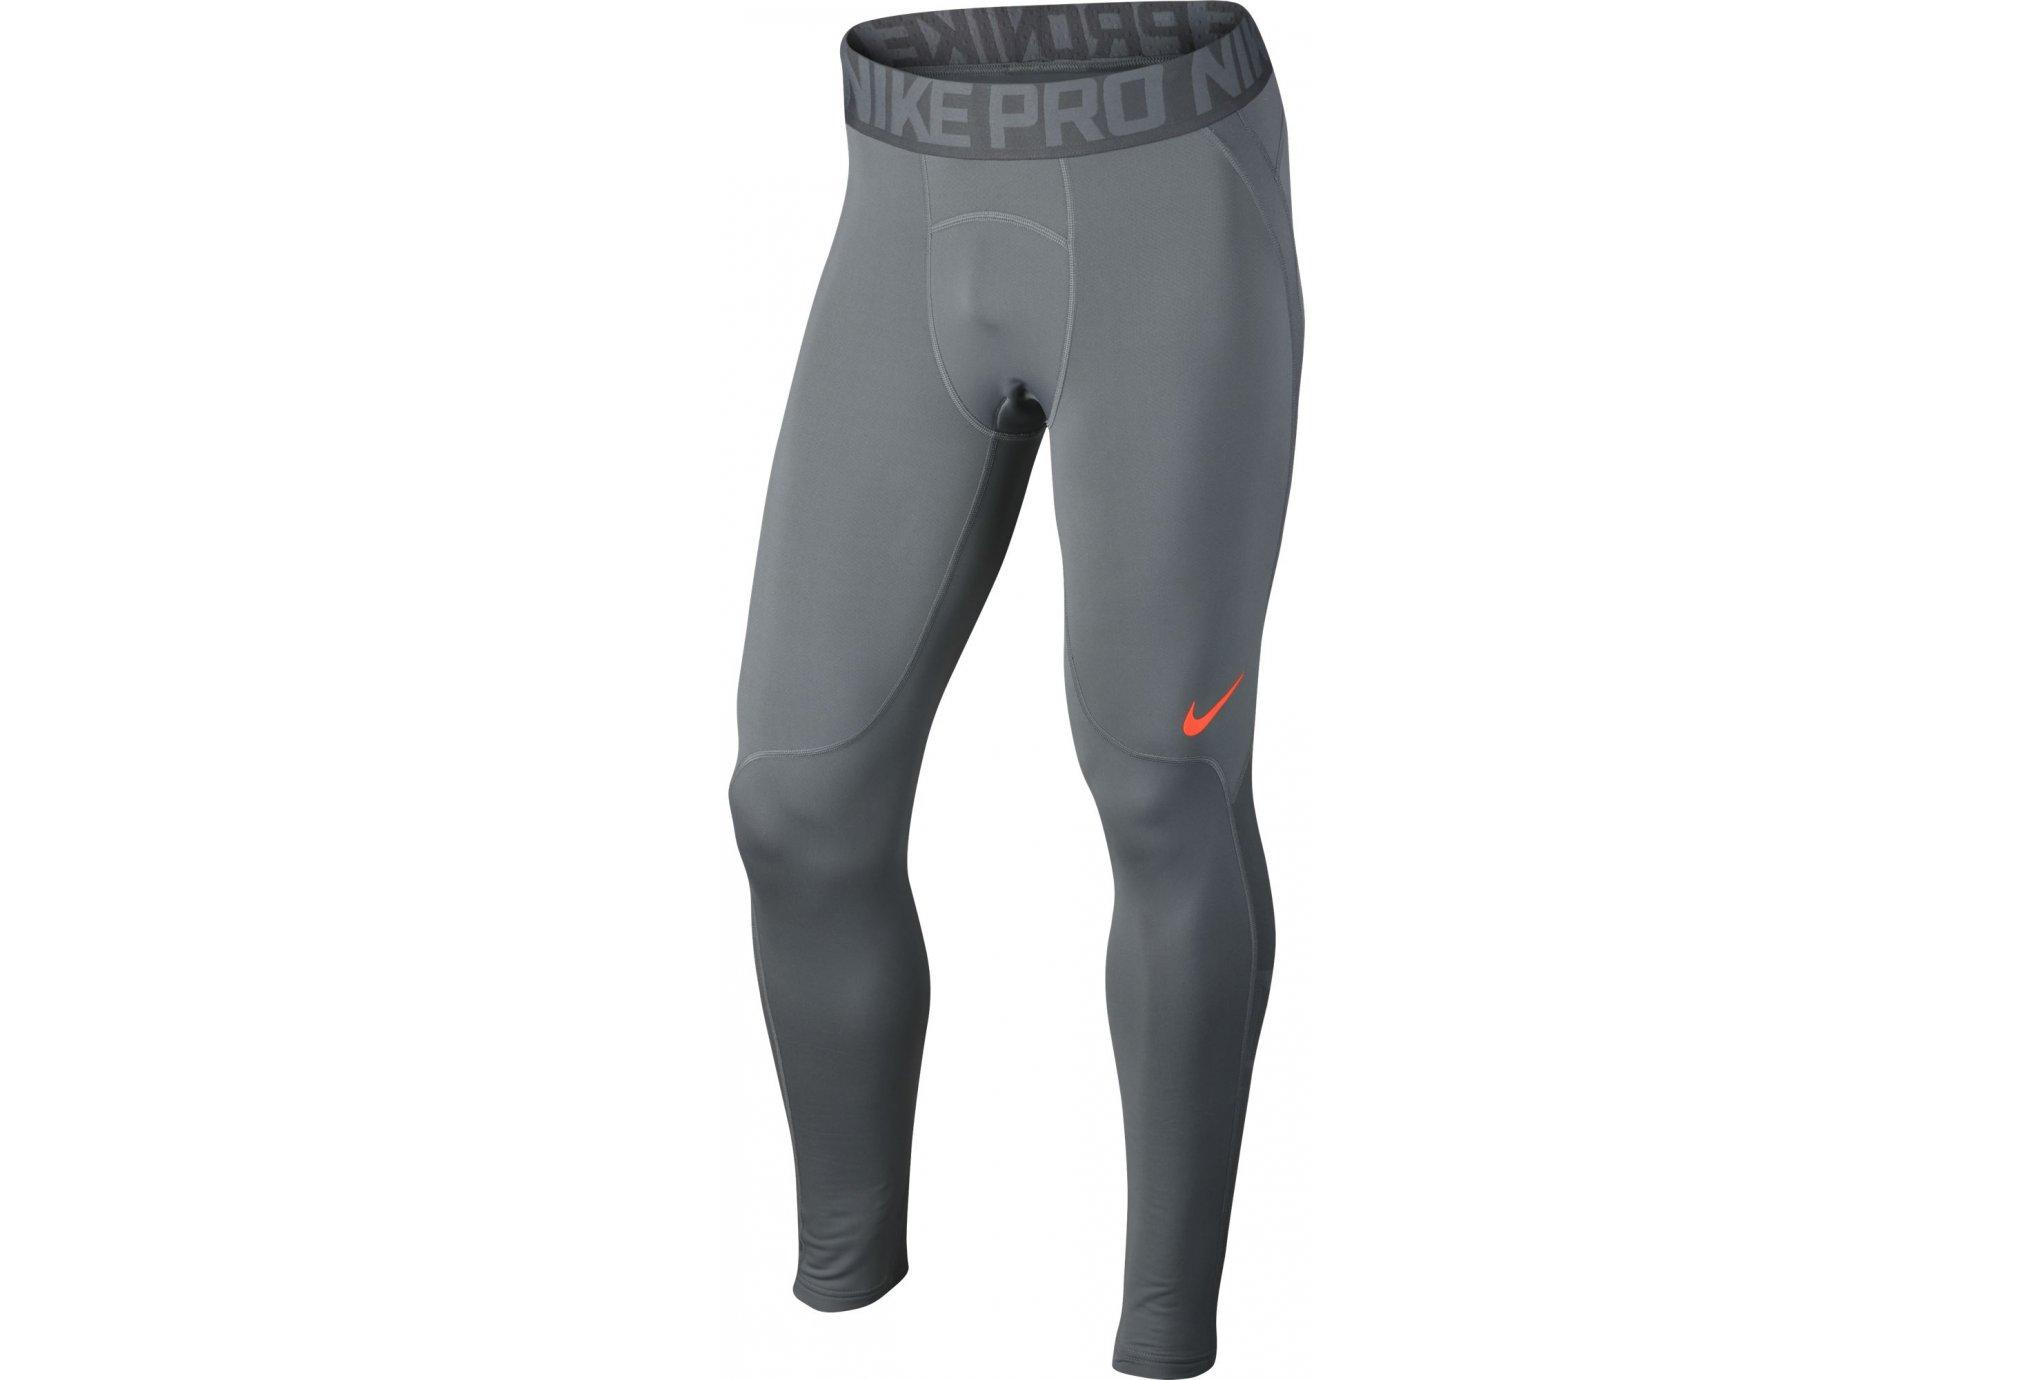 Trail Session - Nike Pro Hyperwarm M vêtement running homme 375c7ec3a3bd